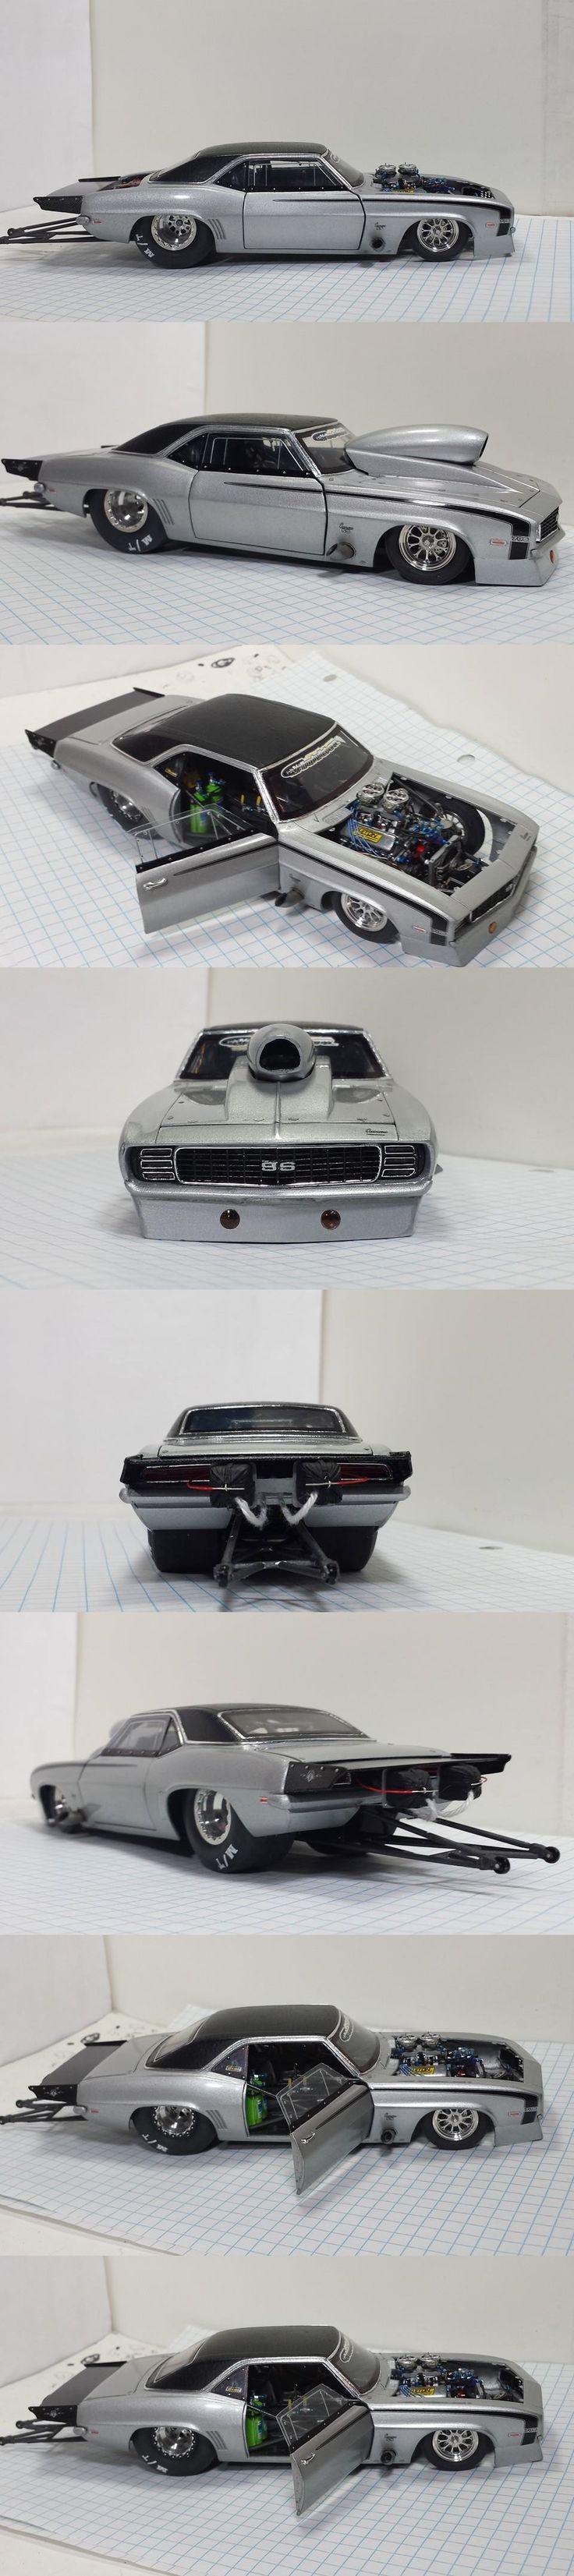 '69 Camaro race car.